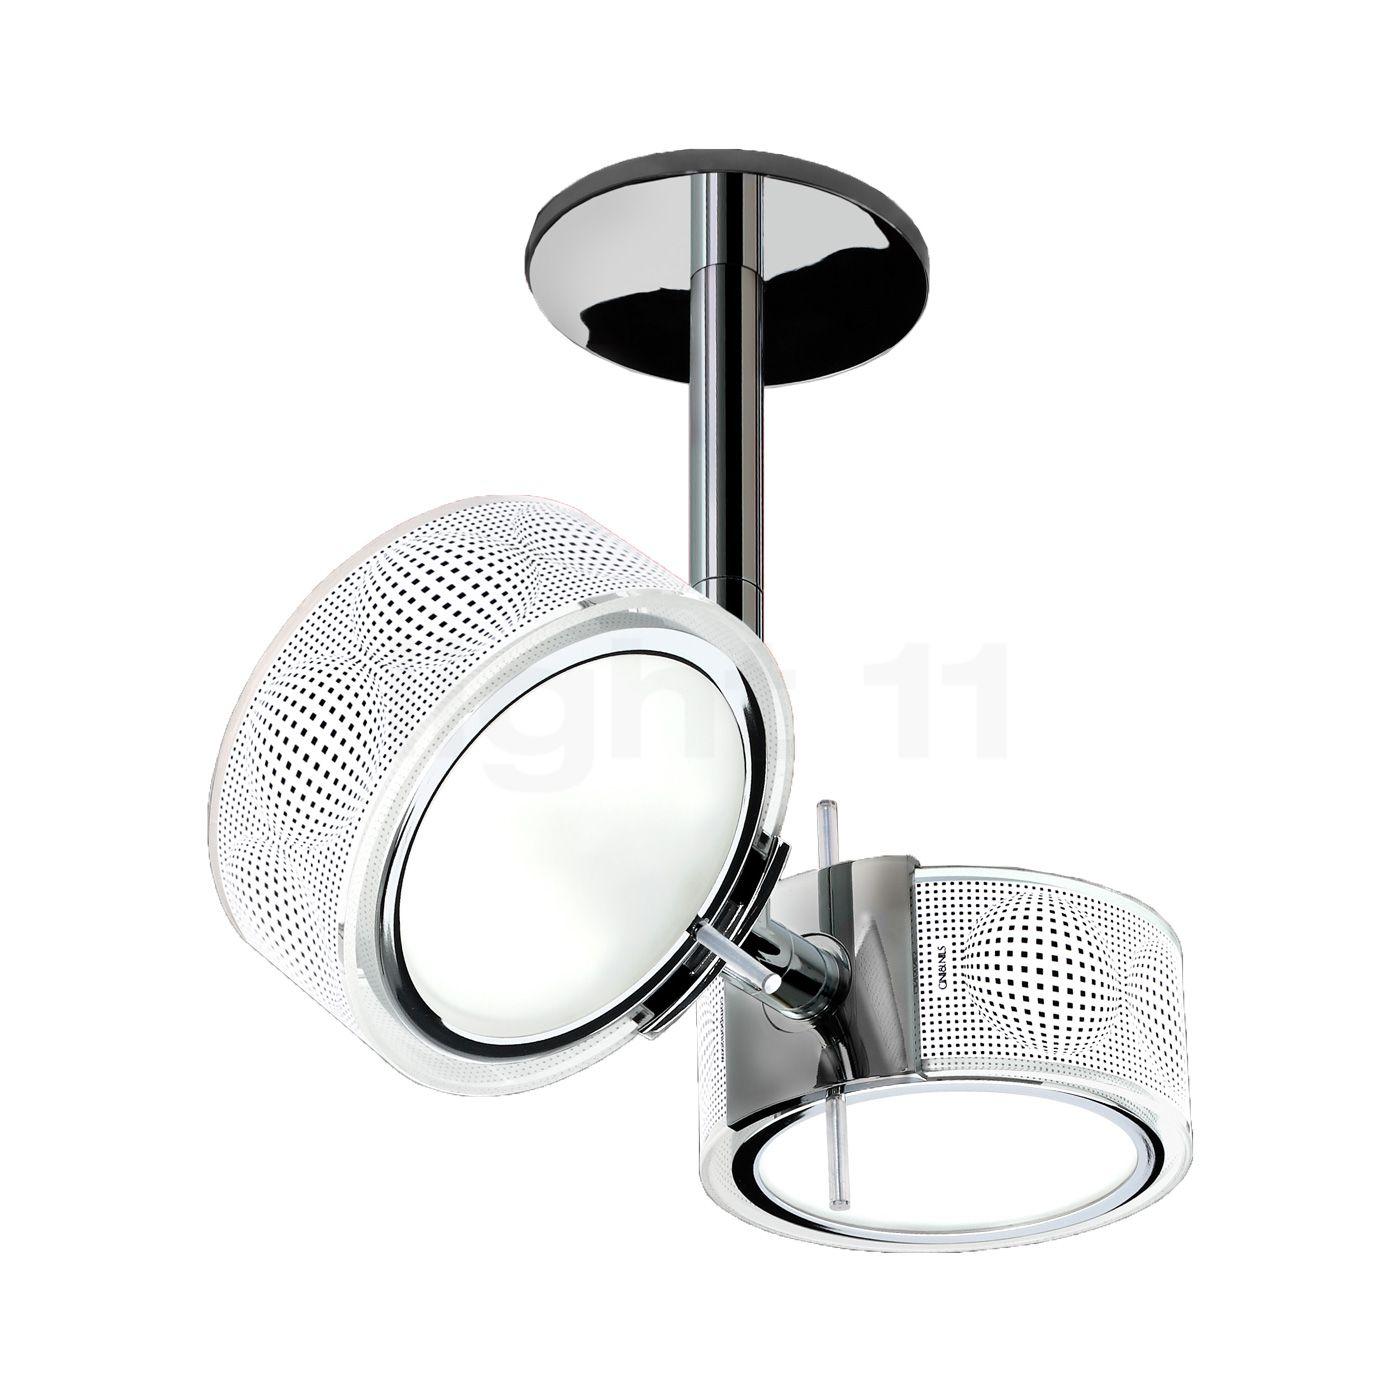 cini nils componi200 due parete soffitto 25 wall lights. Black Bedroom Furniture Sets. Home Design Ideas